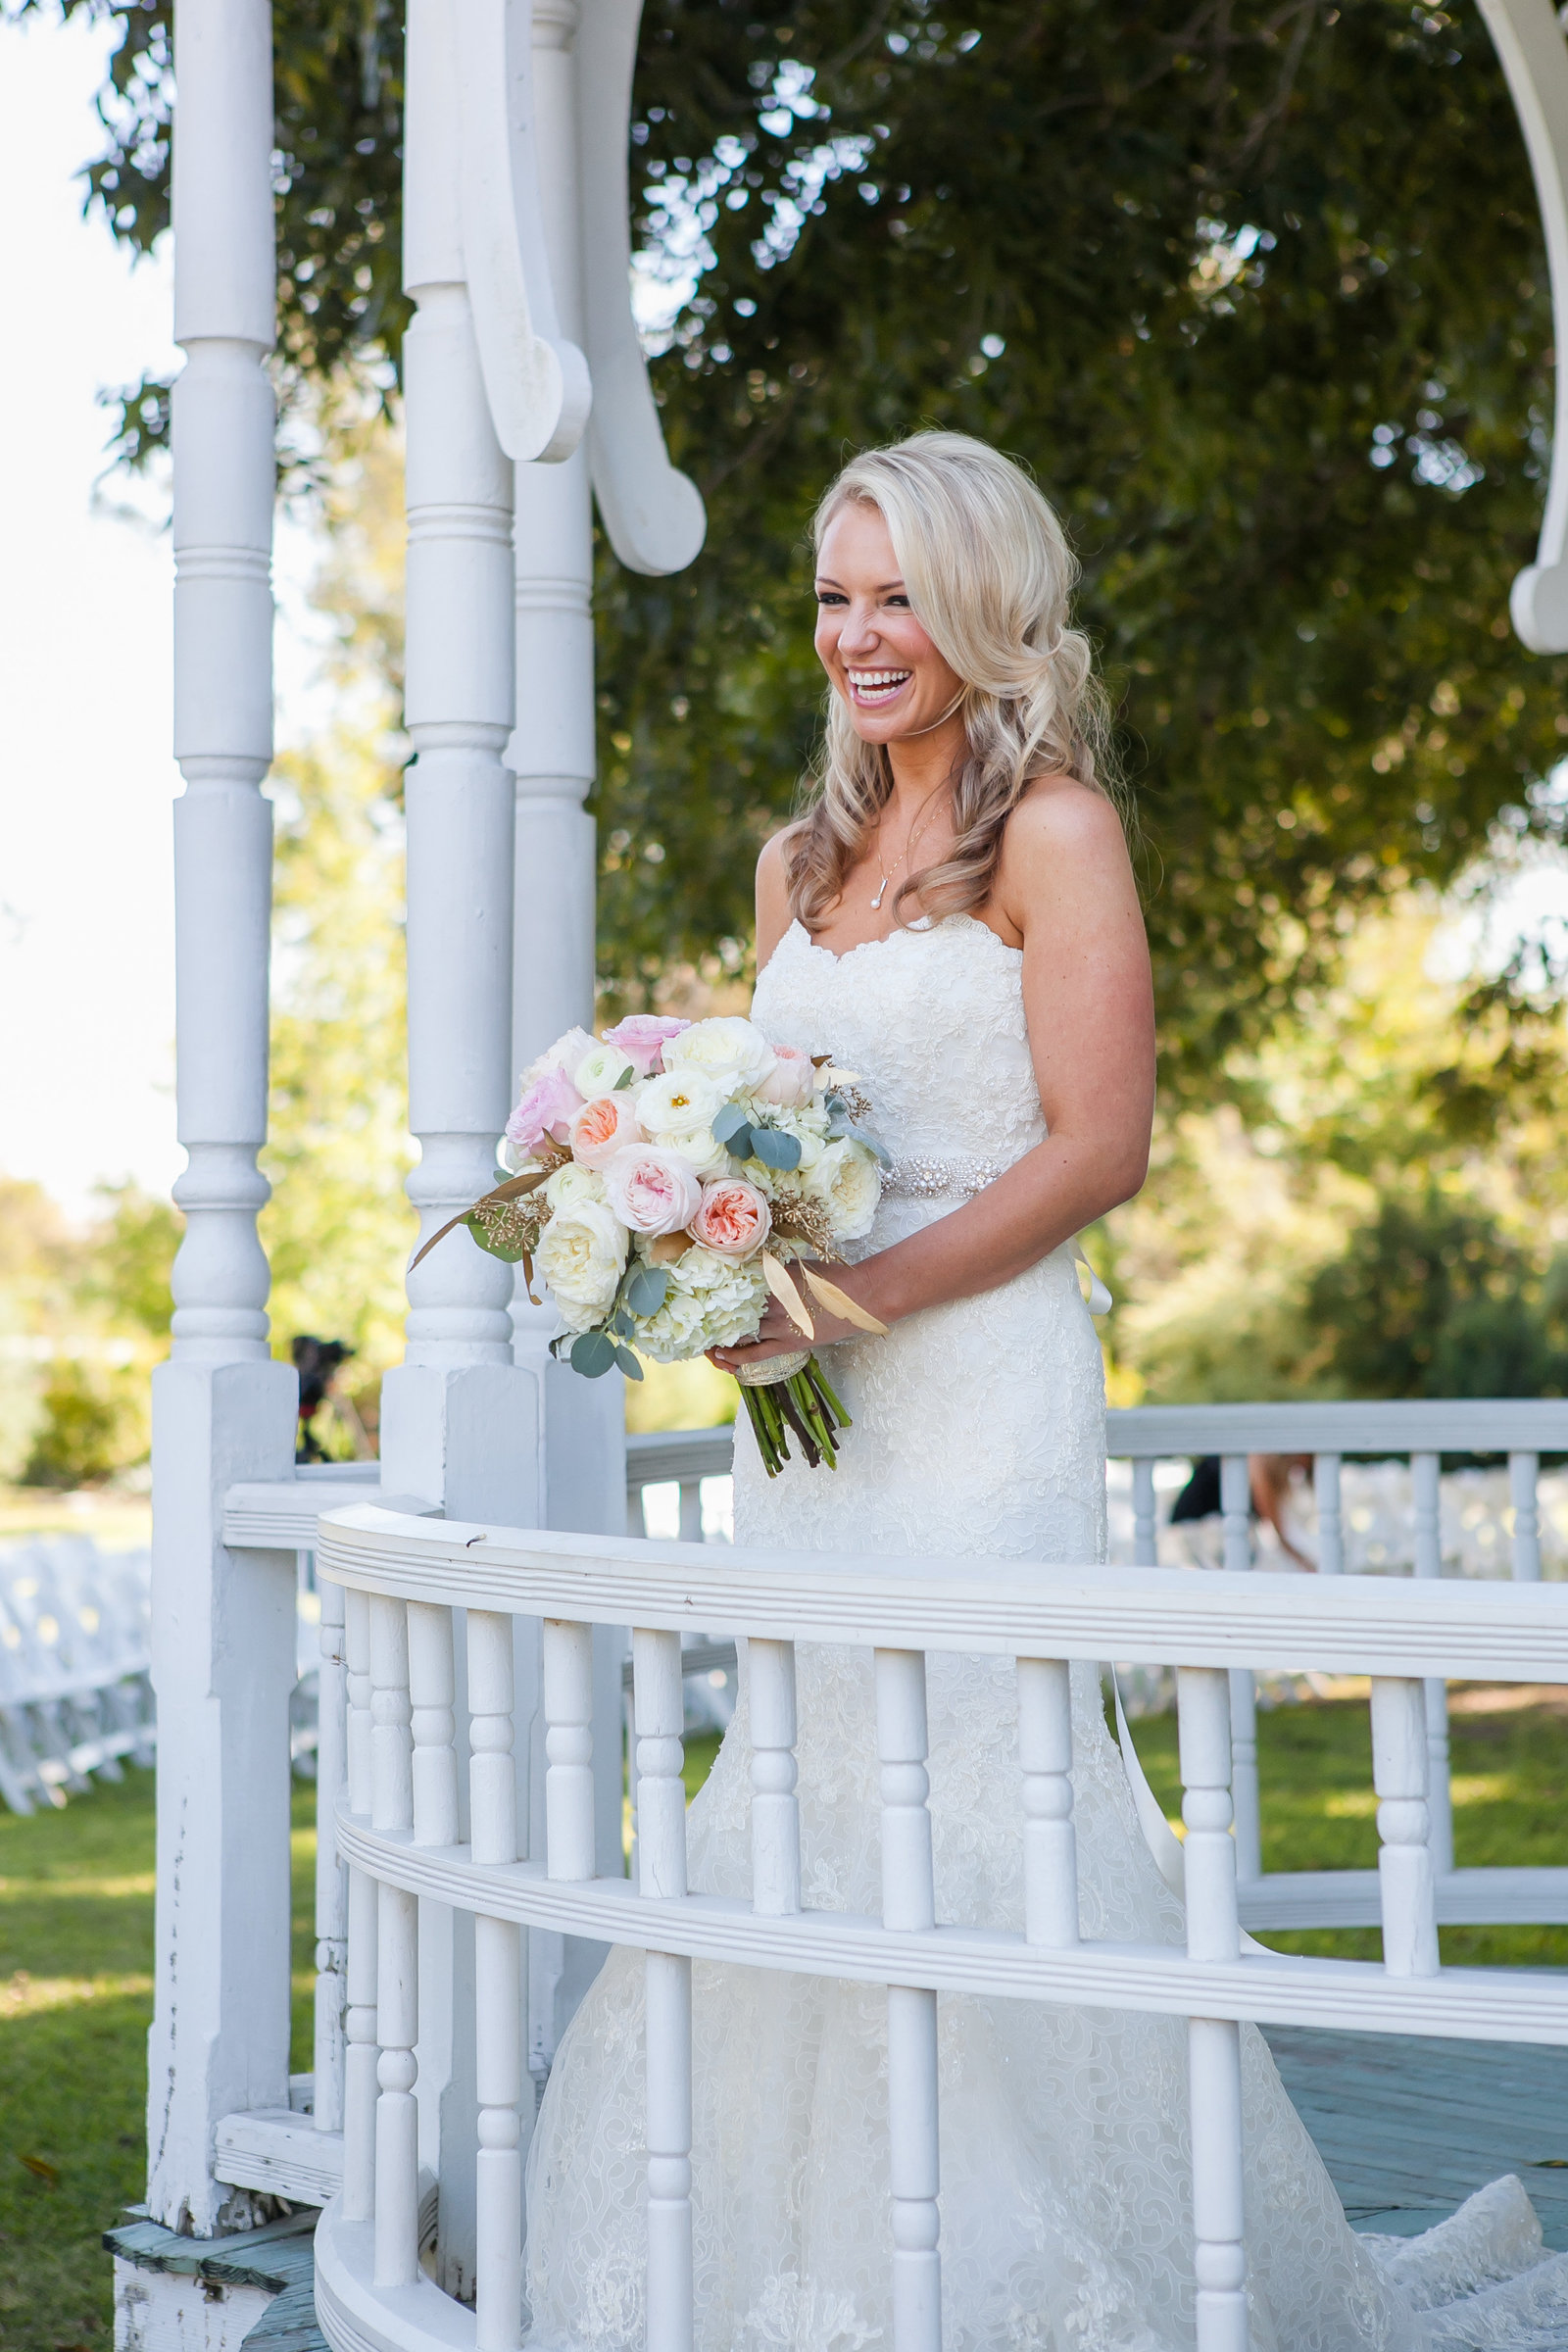 Austin Family Photographer, Tiffany Chapman, bride photo